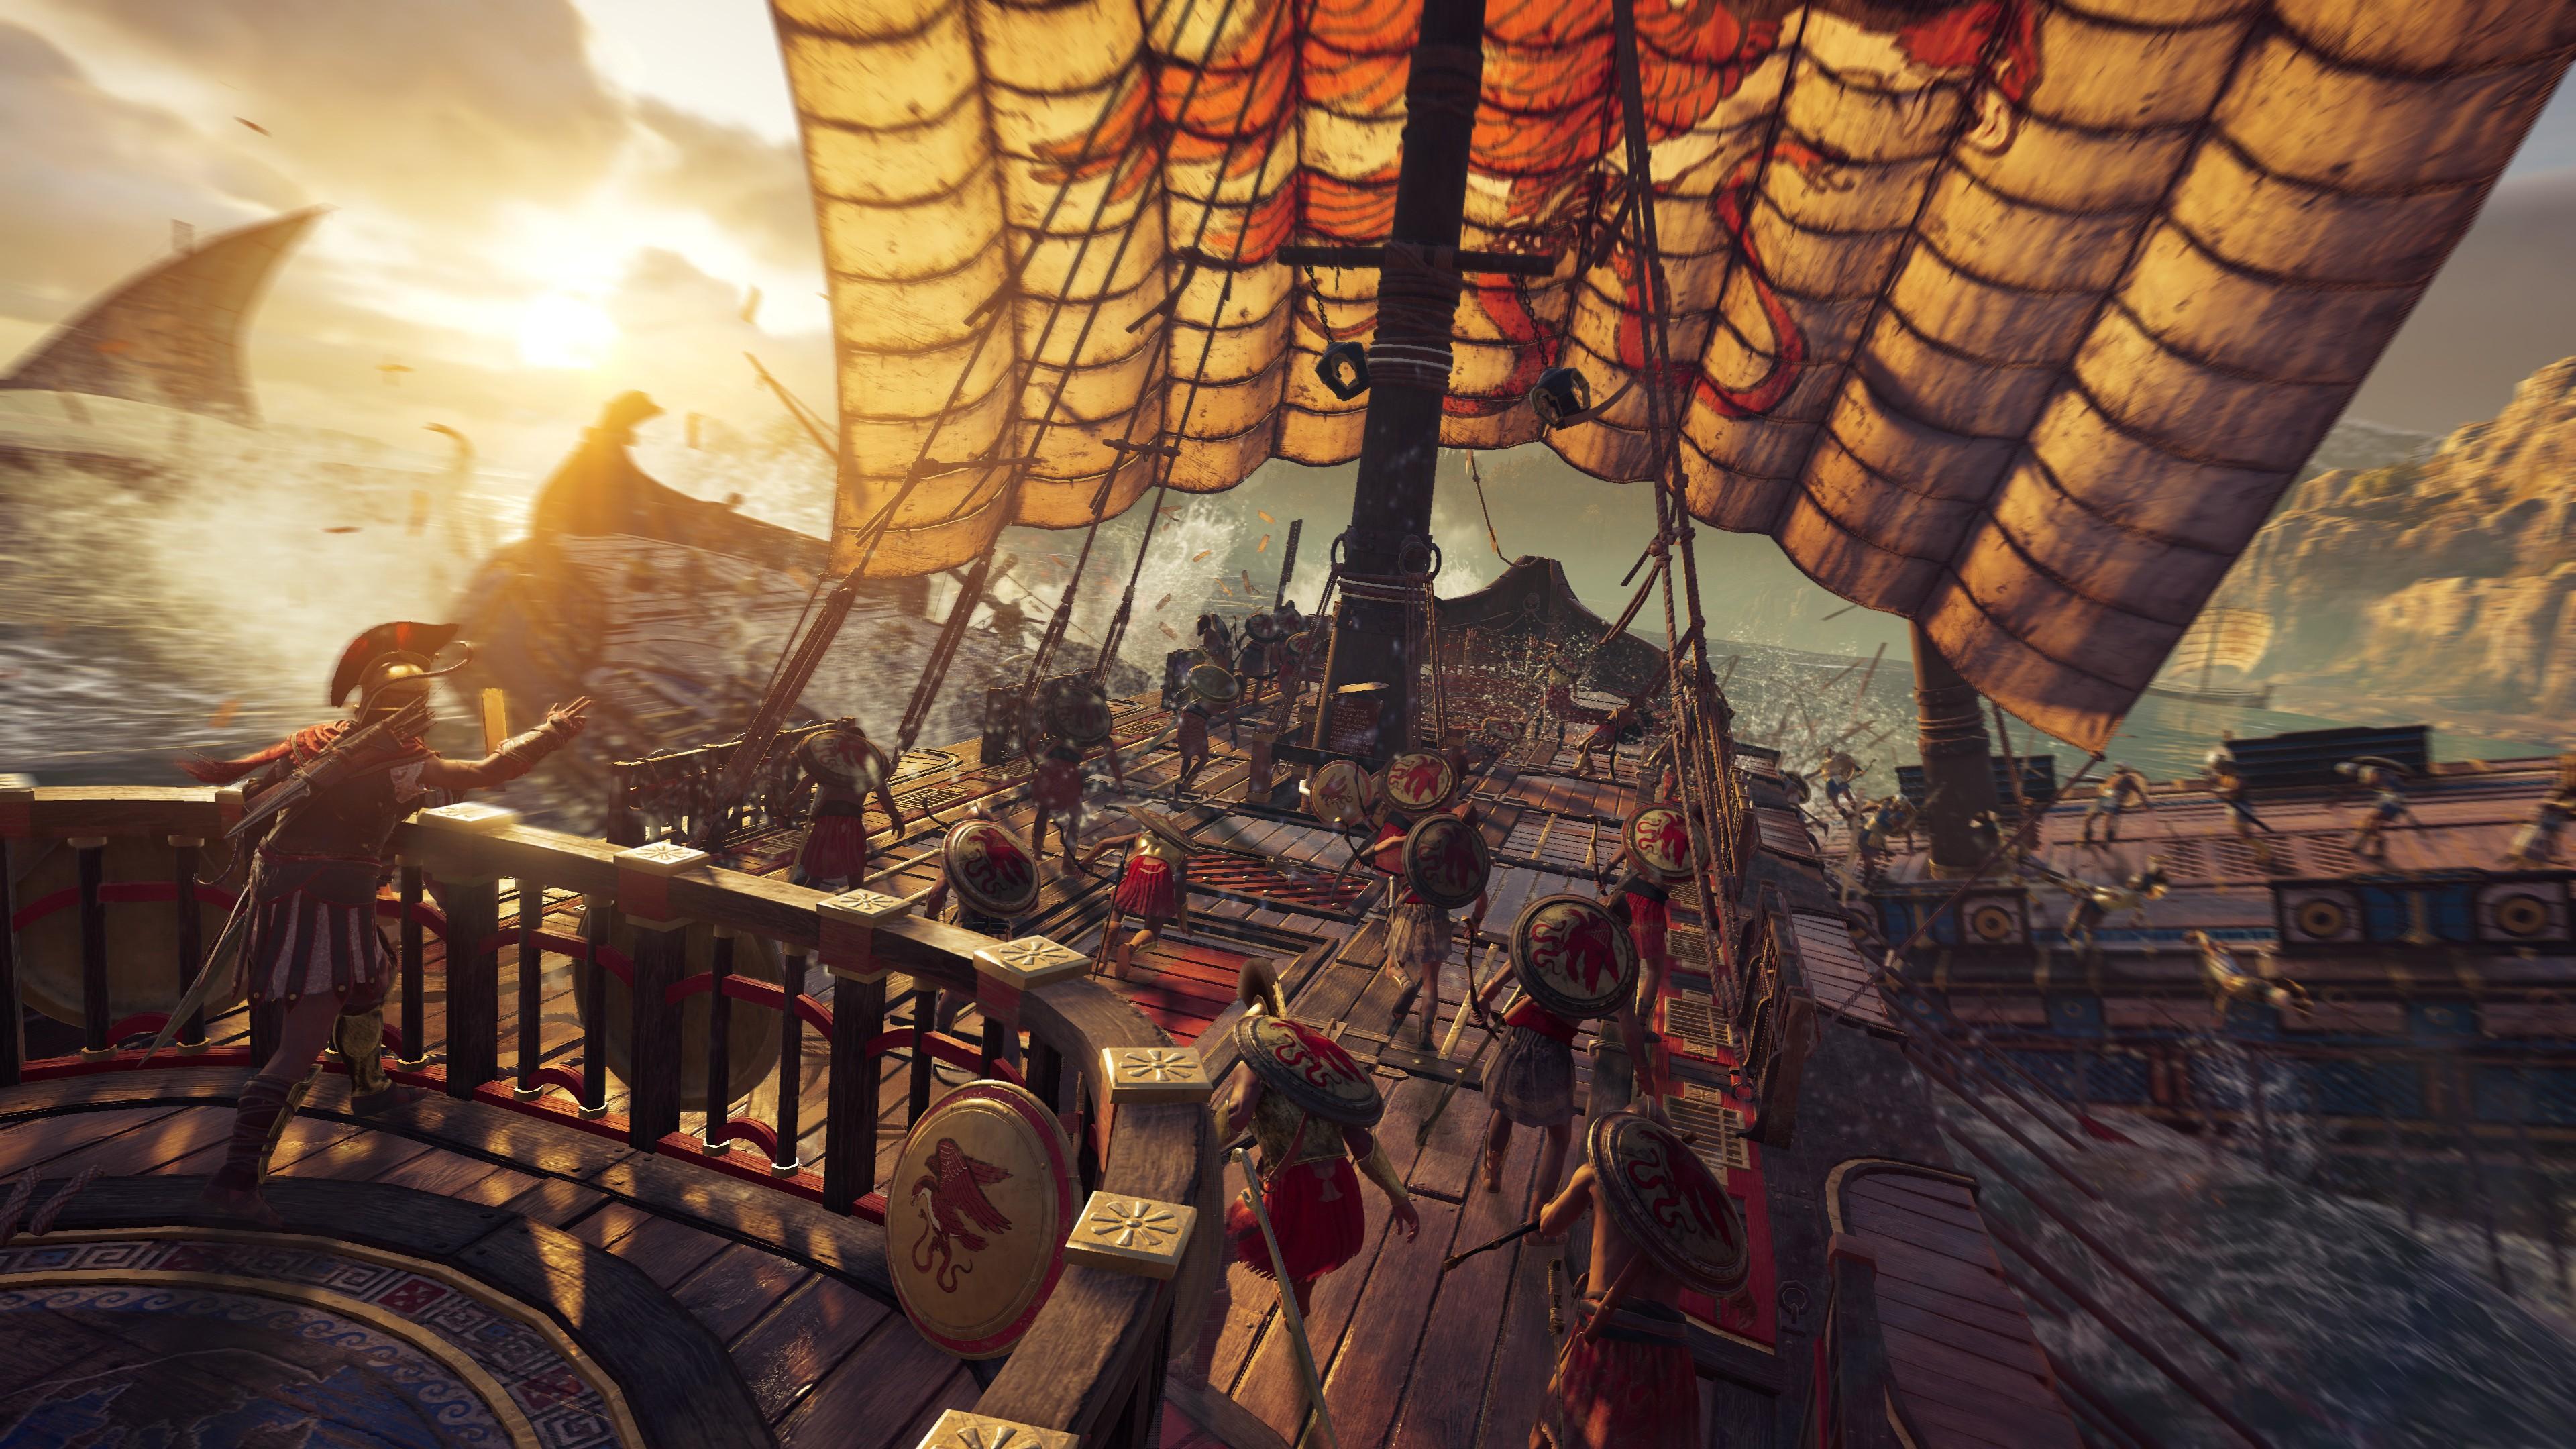 Wallpaper Assassin U0026 39 S Creed Odyssey E3 2018 Screenshot